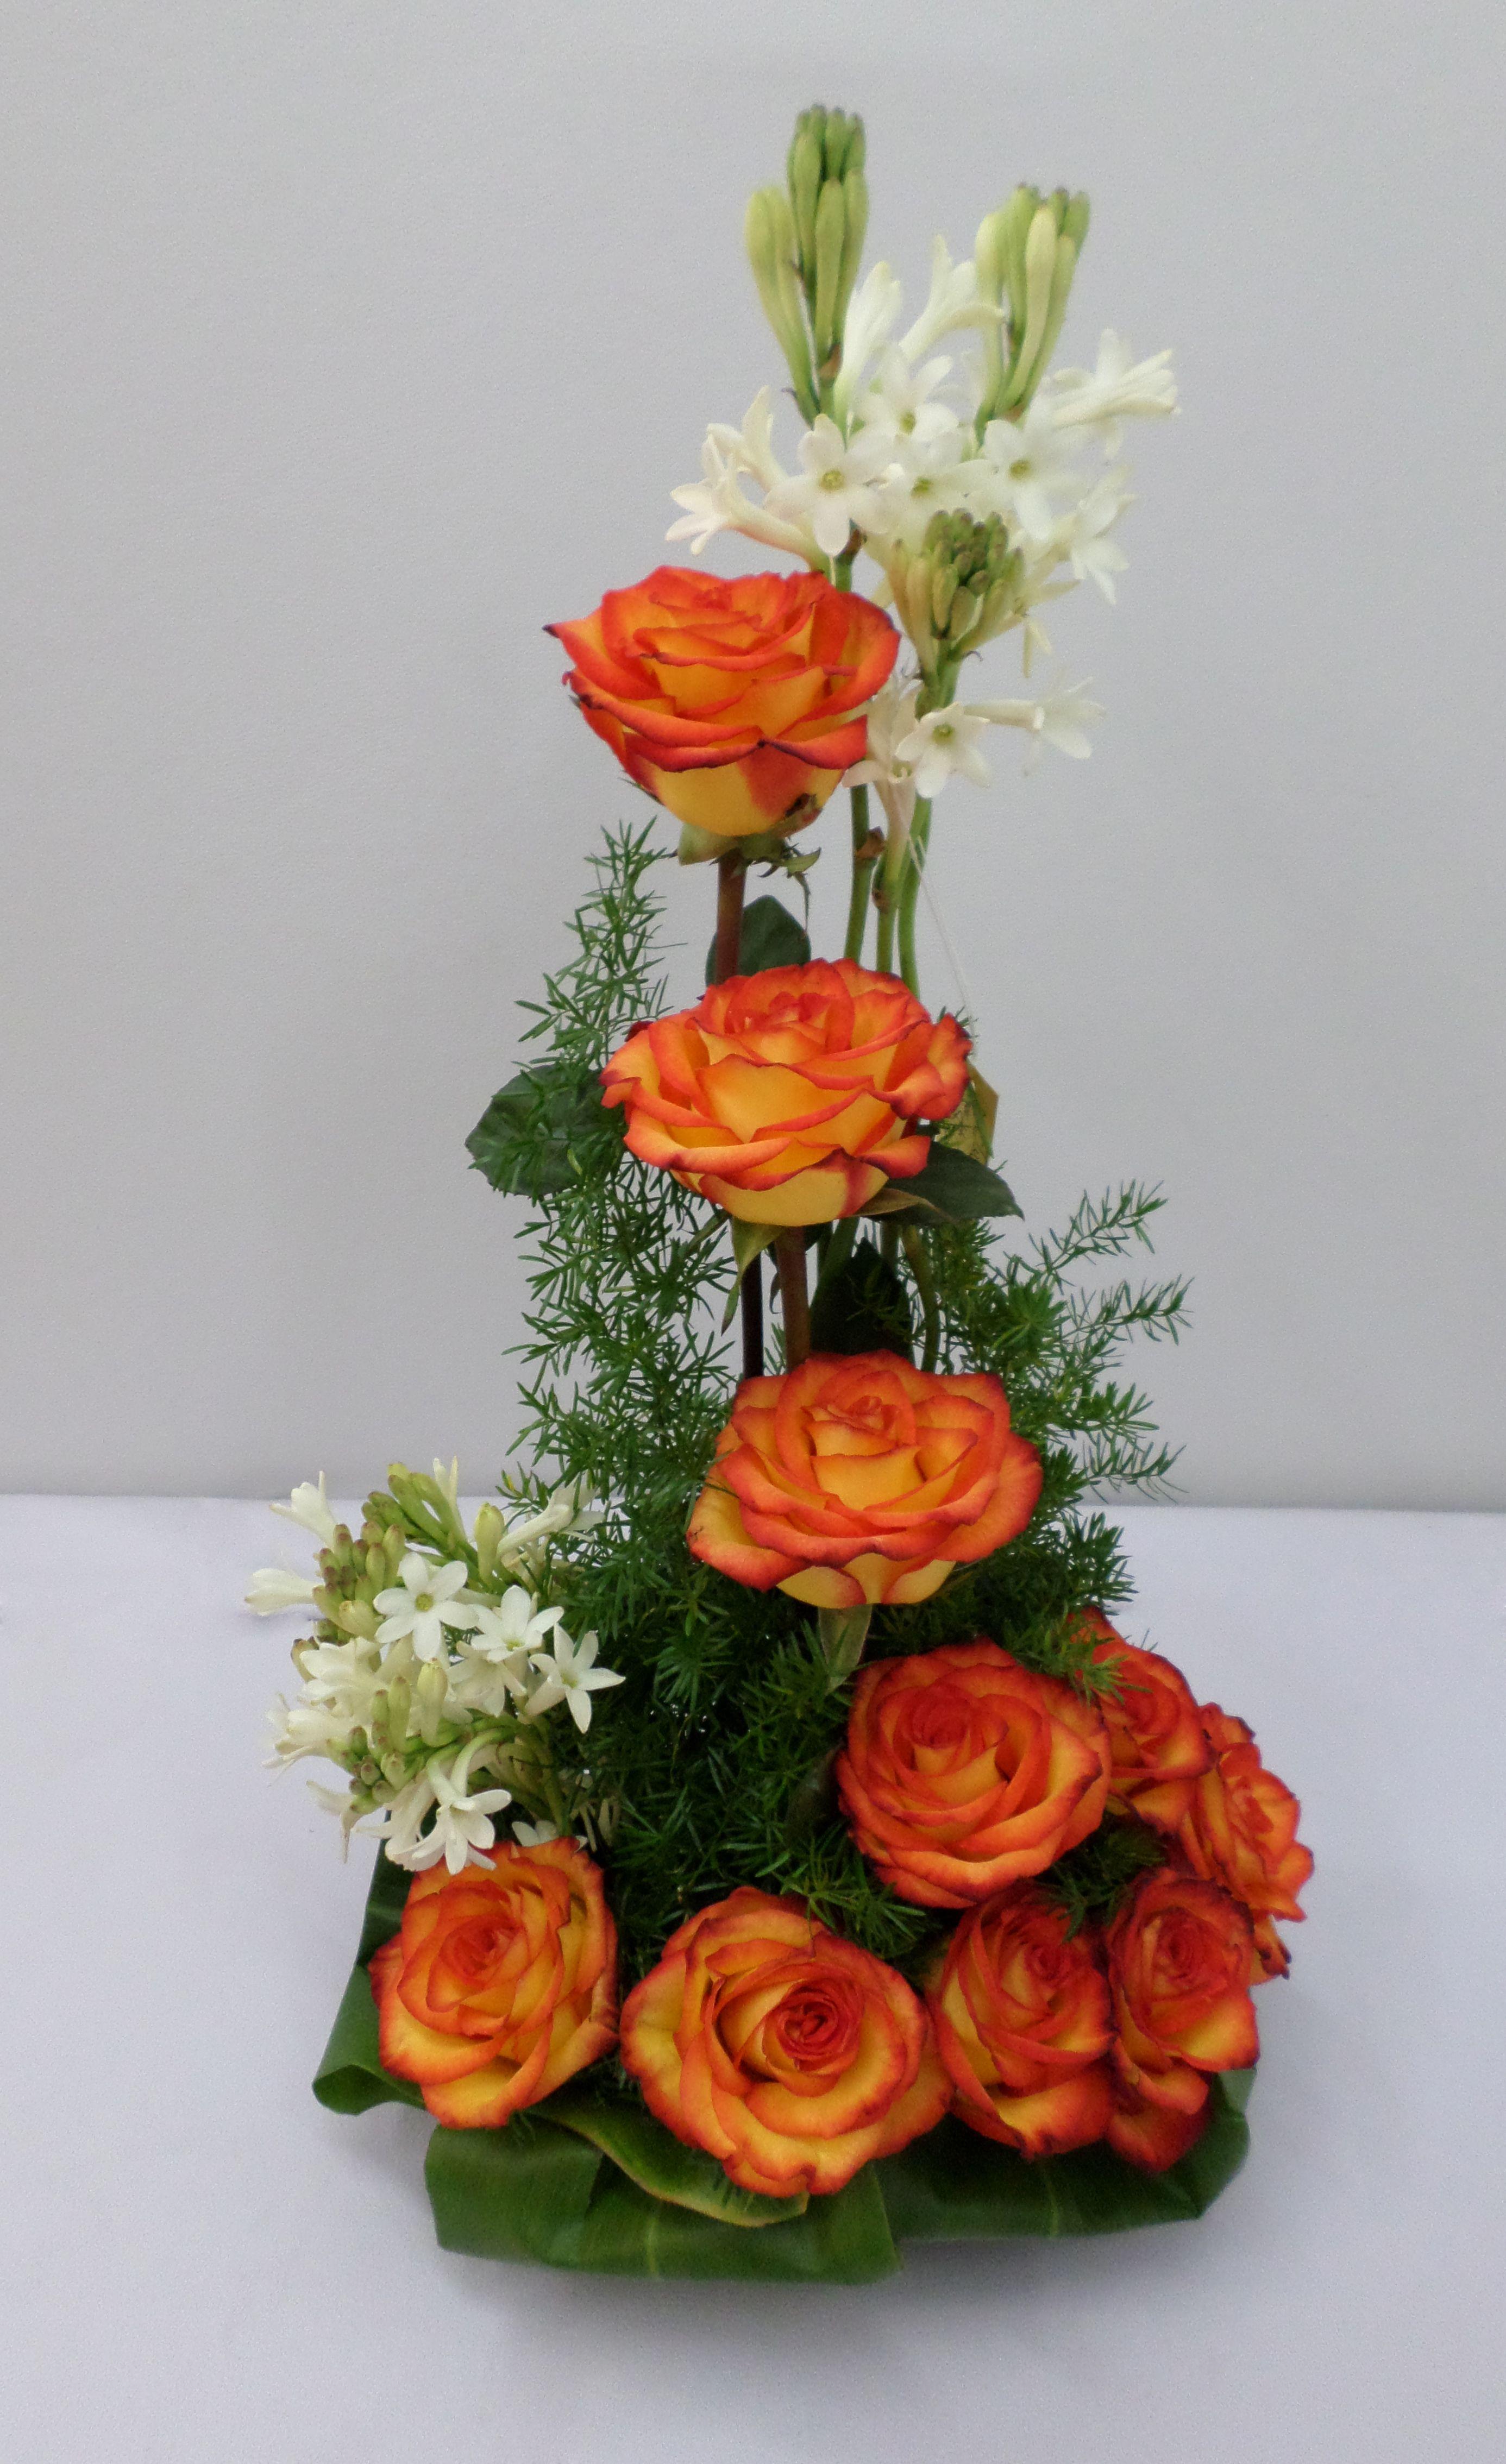 Pin by on pinterest flower arrangements beautiful flowers funeral flowerschurch flowersdiy izmirmasajfo Choice Image